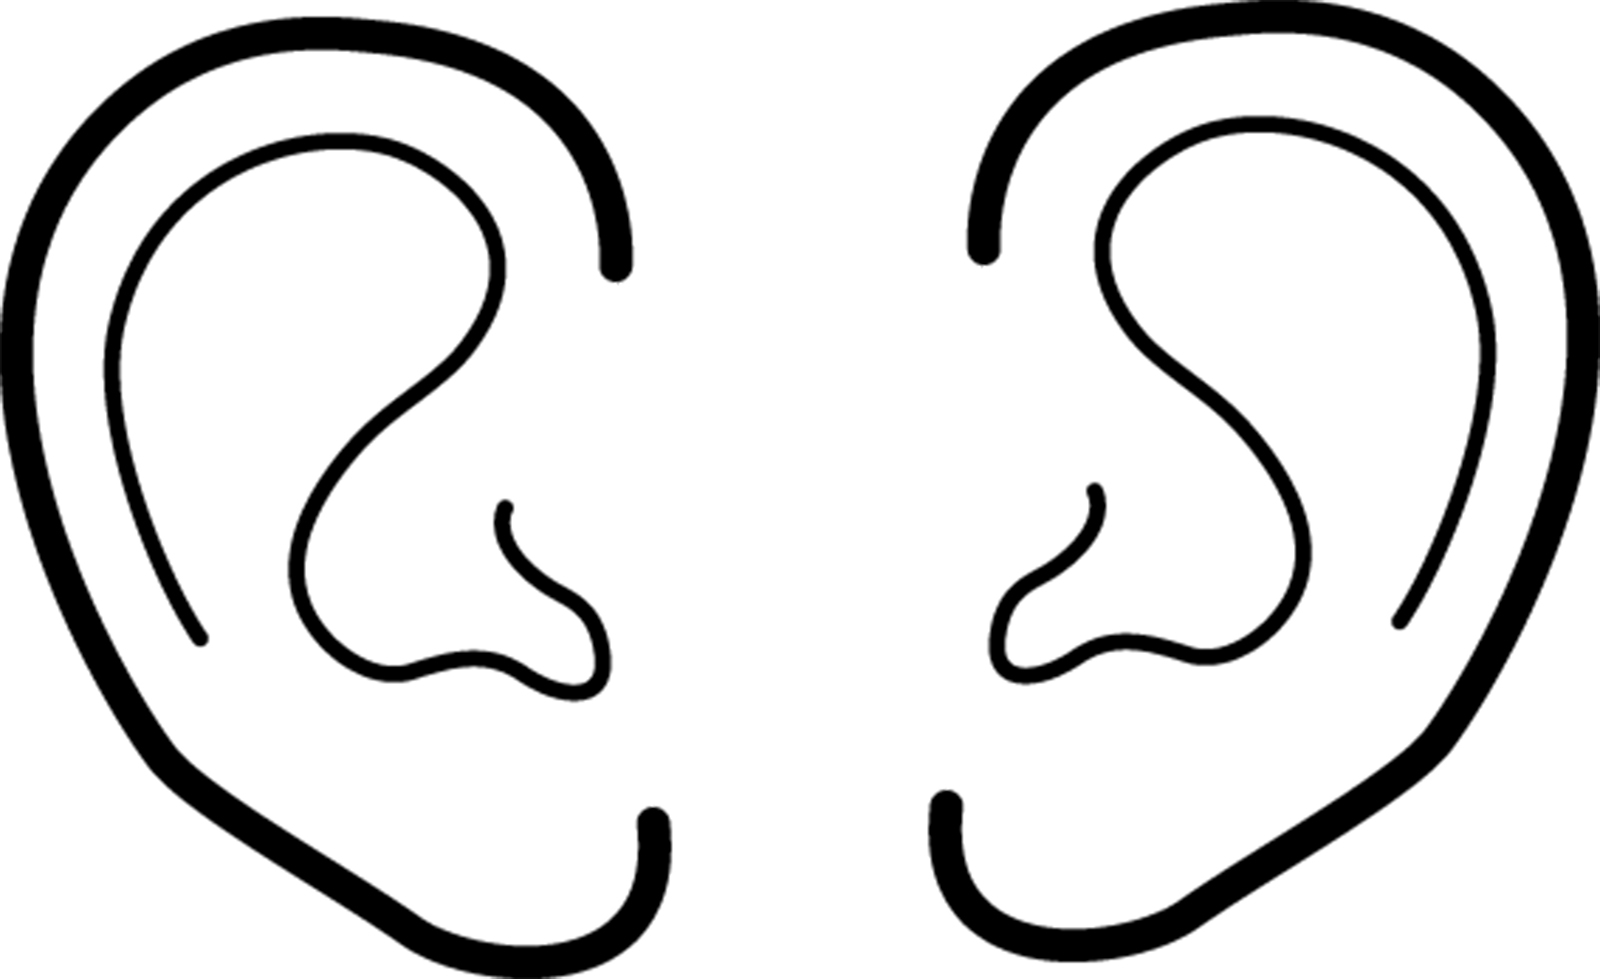 Ear clipart earclipart images listening -Ear clipart earclipart images listening clip art photo-4